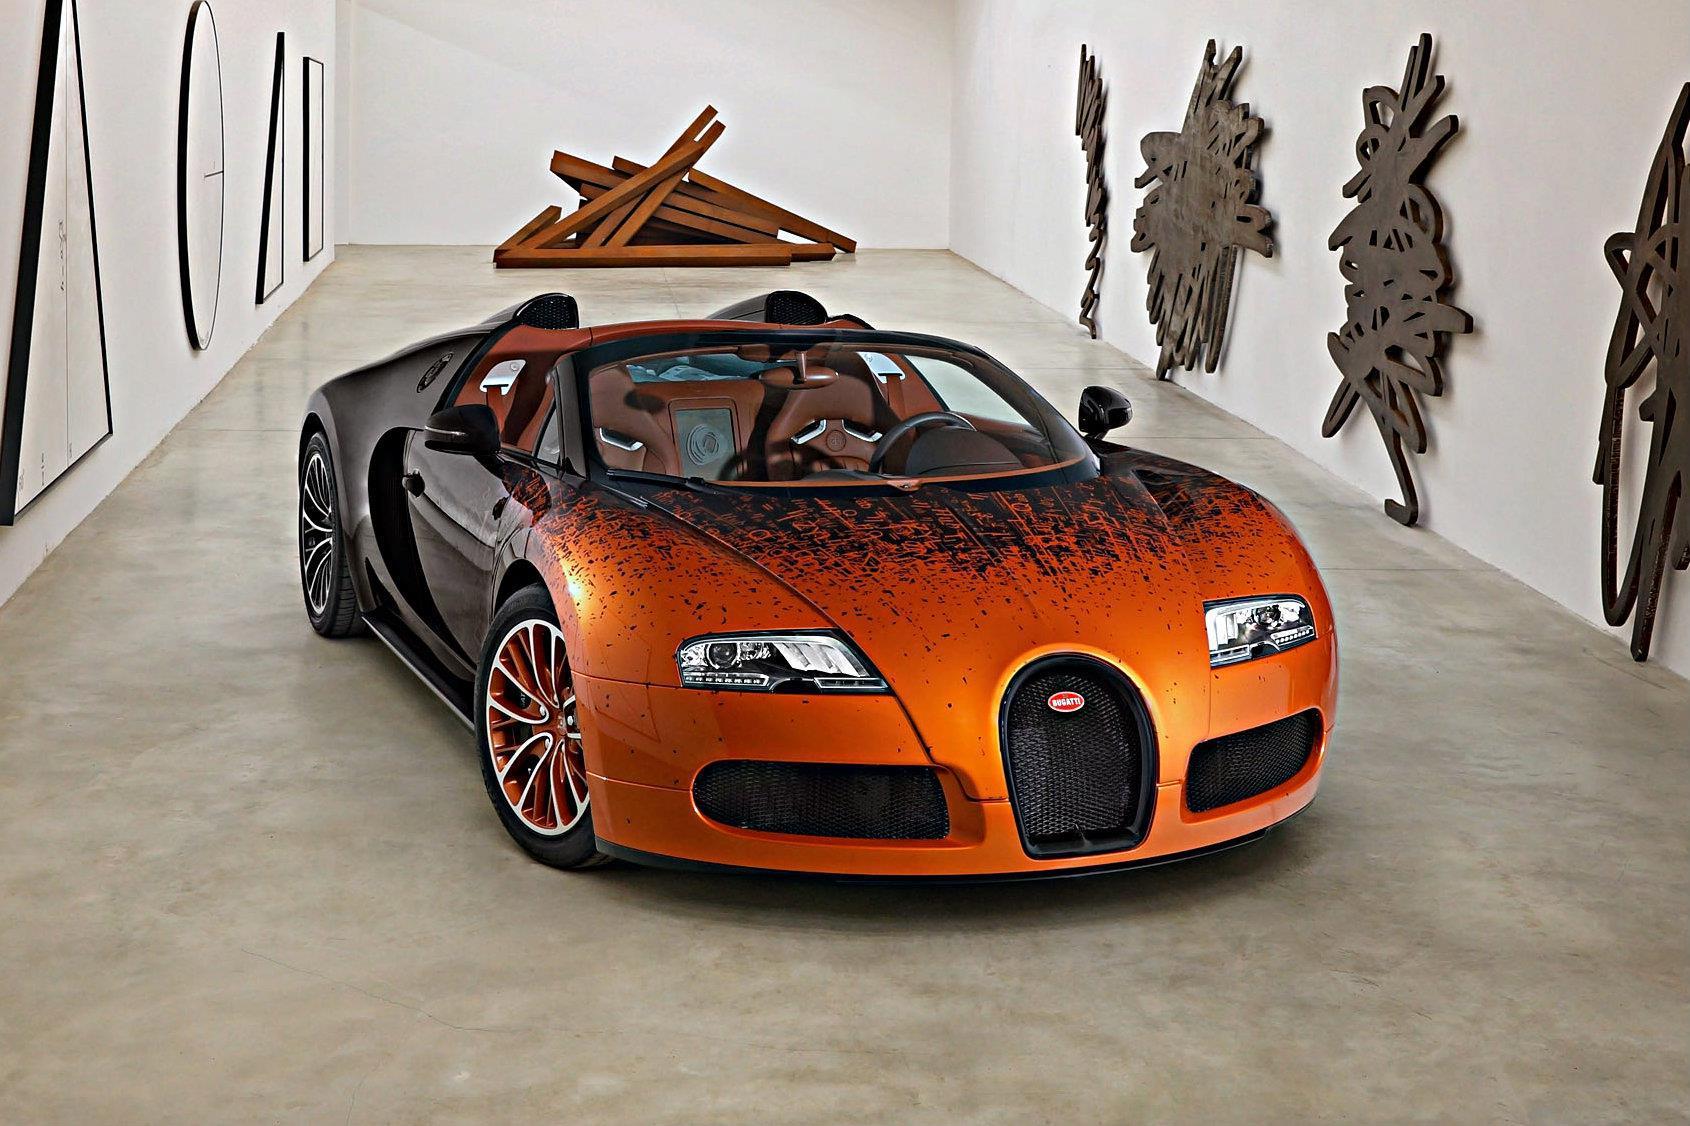 bugatti grand sport venet blends art and science video. Black Bedroom Furniture Sets. Home Design Ideas